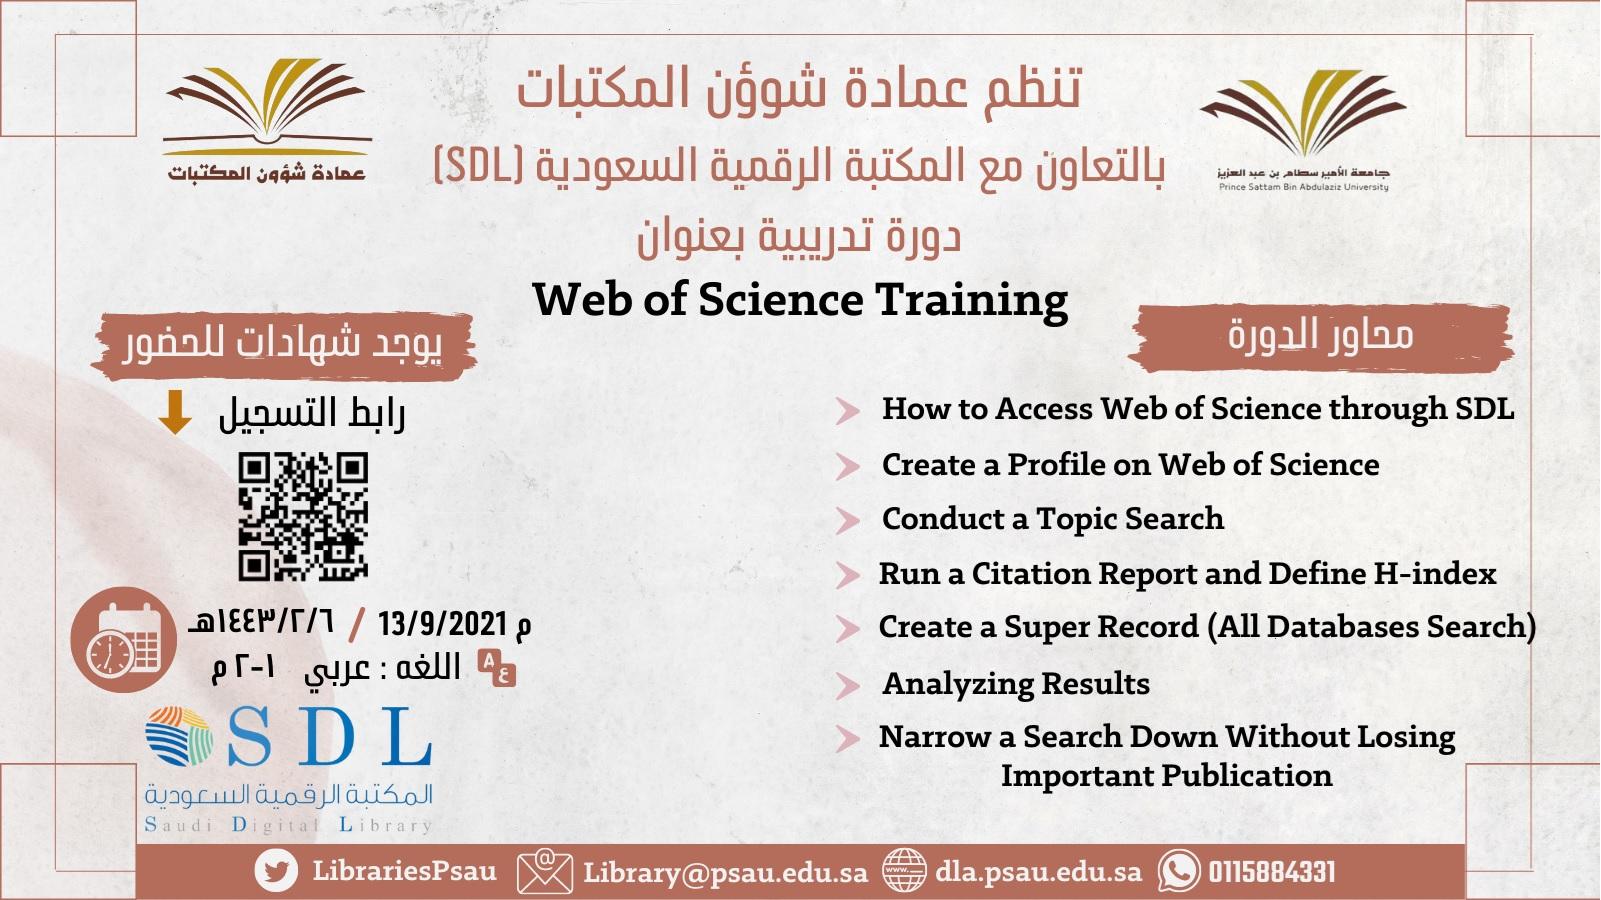 Web of Science Training